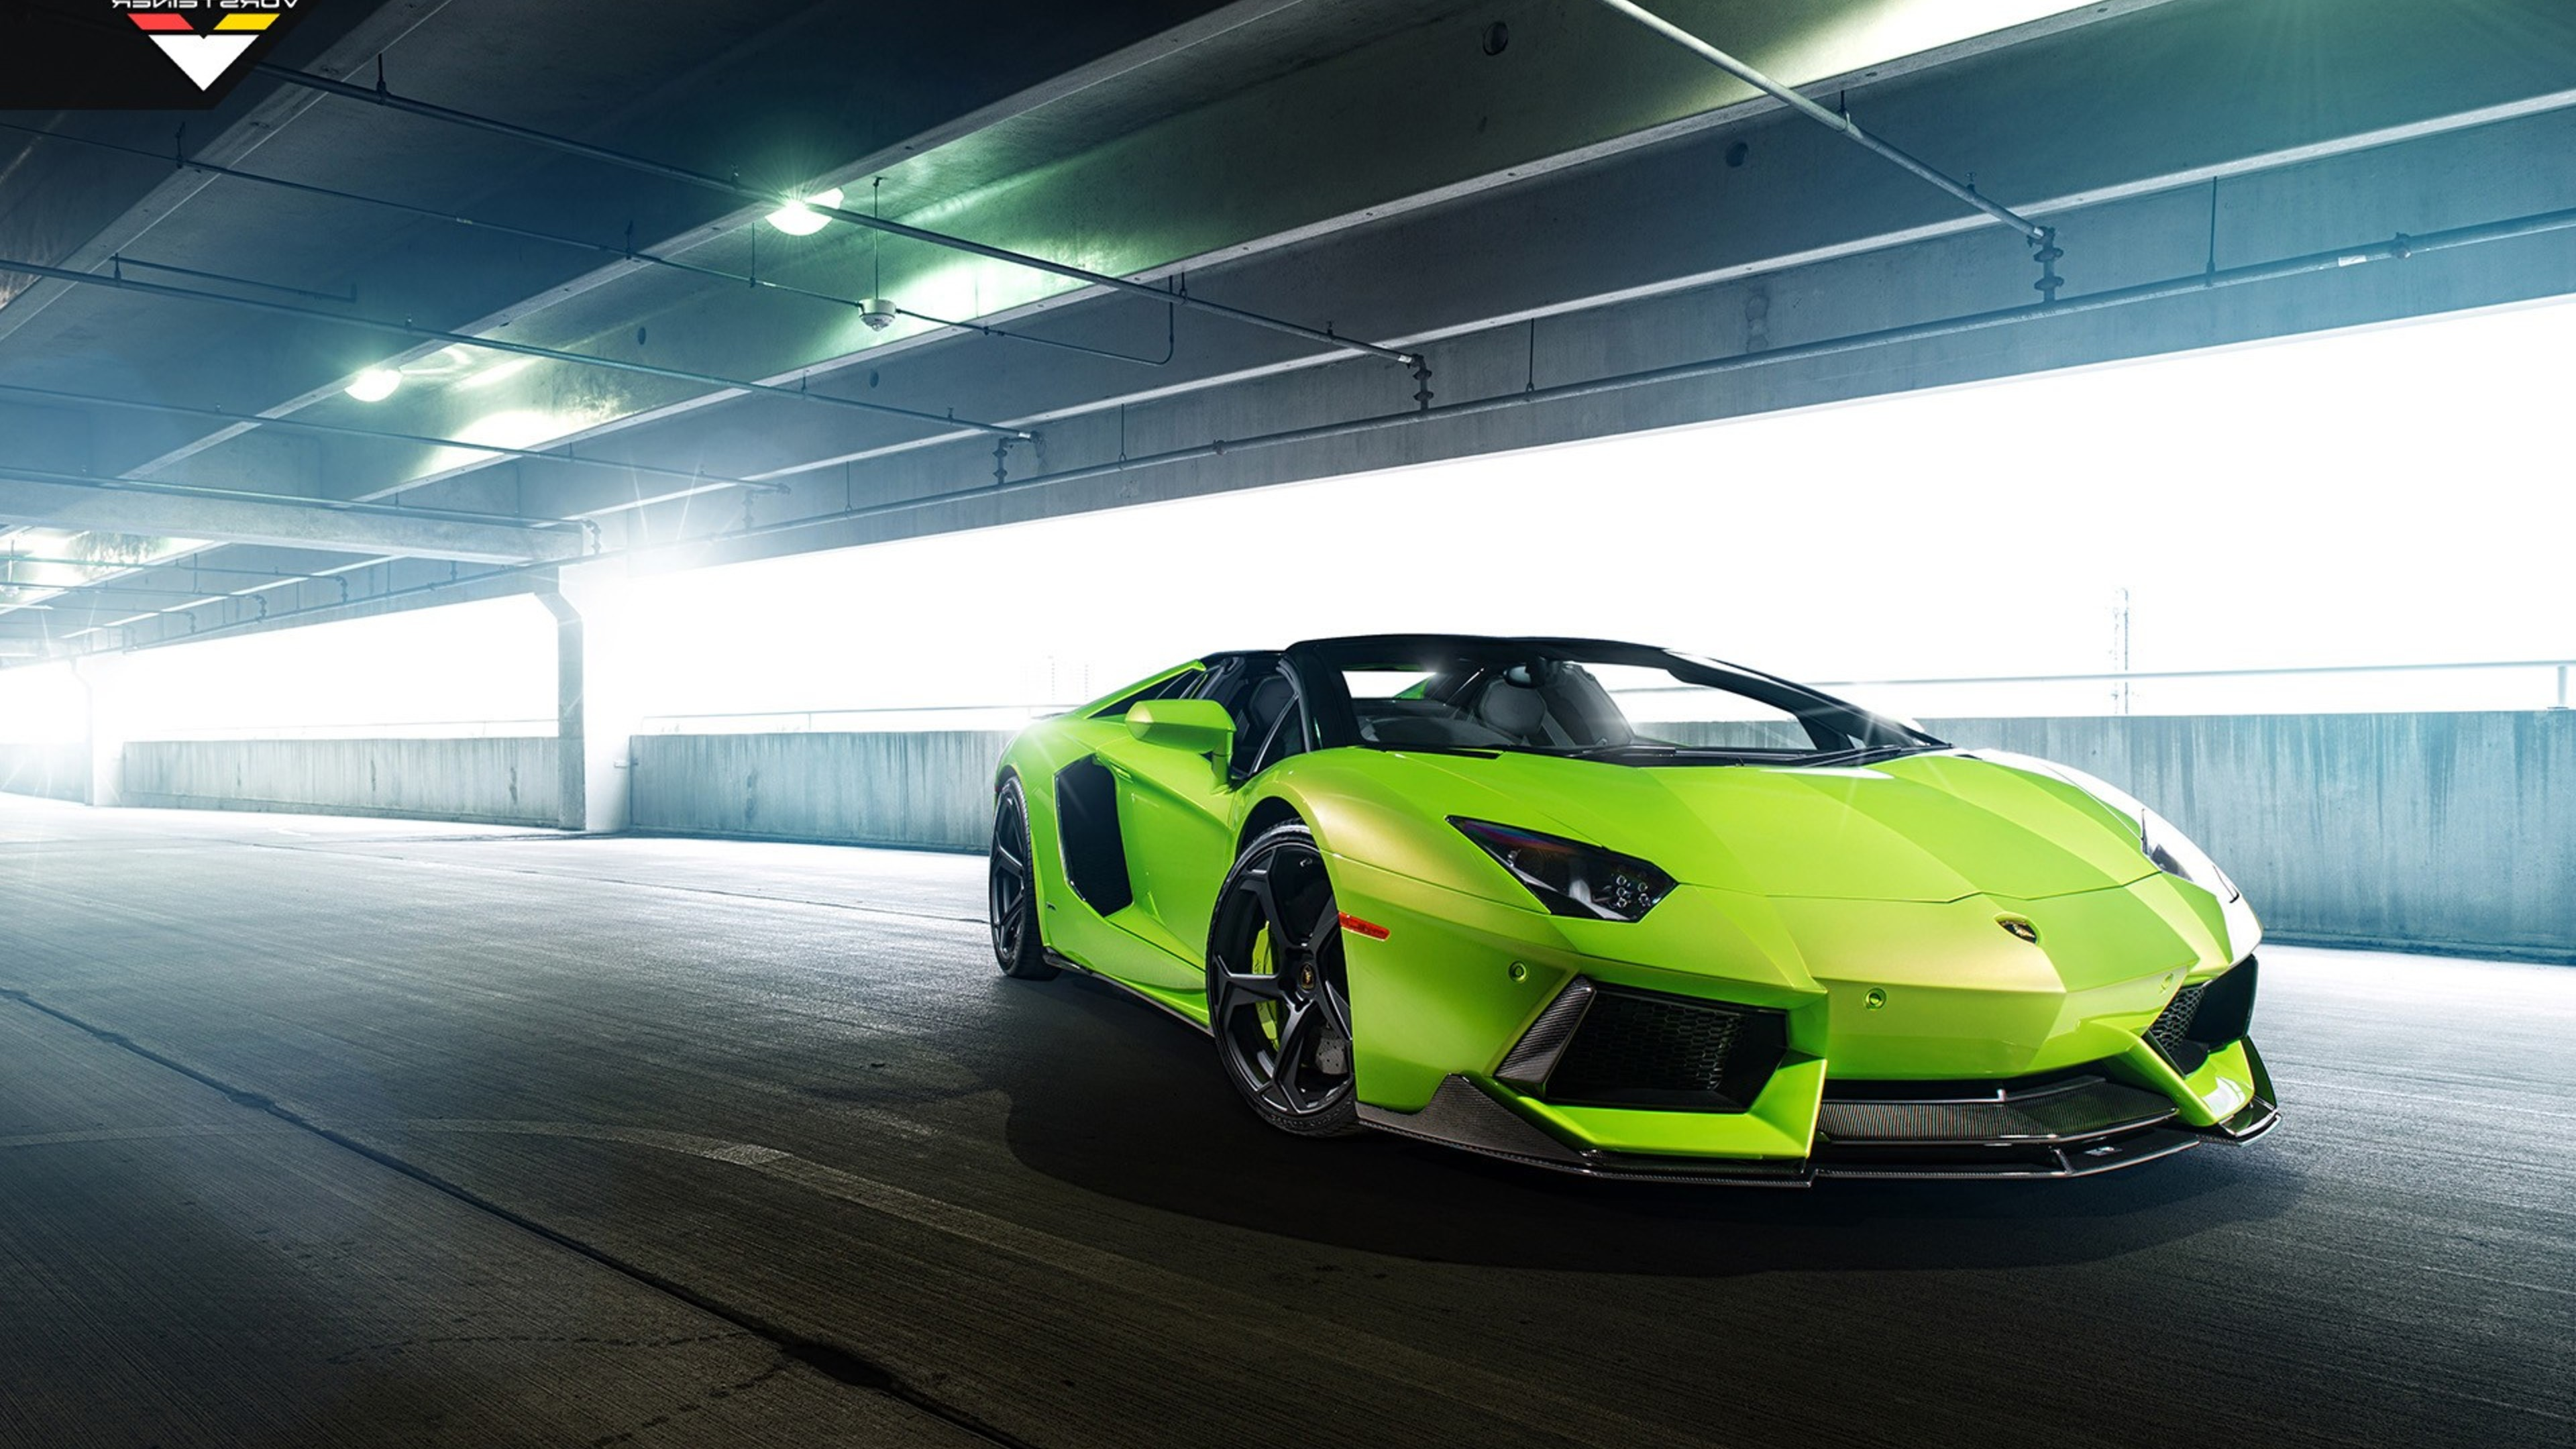 Lamborghini Green Hd Cars 4k Wallpapers Images